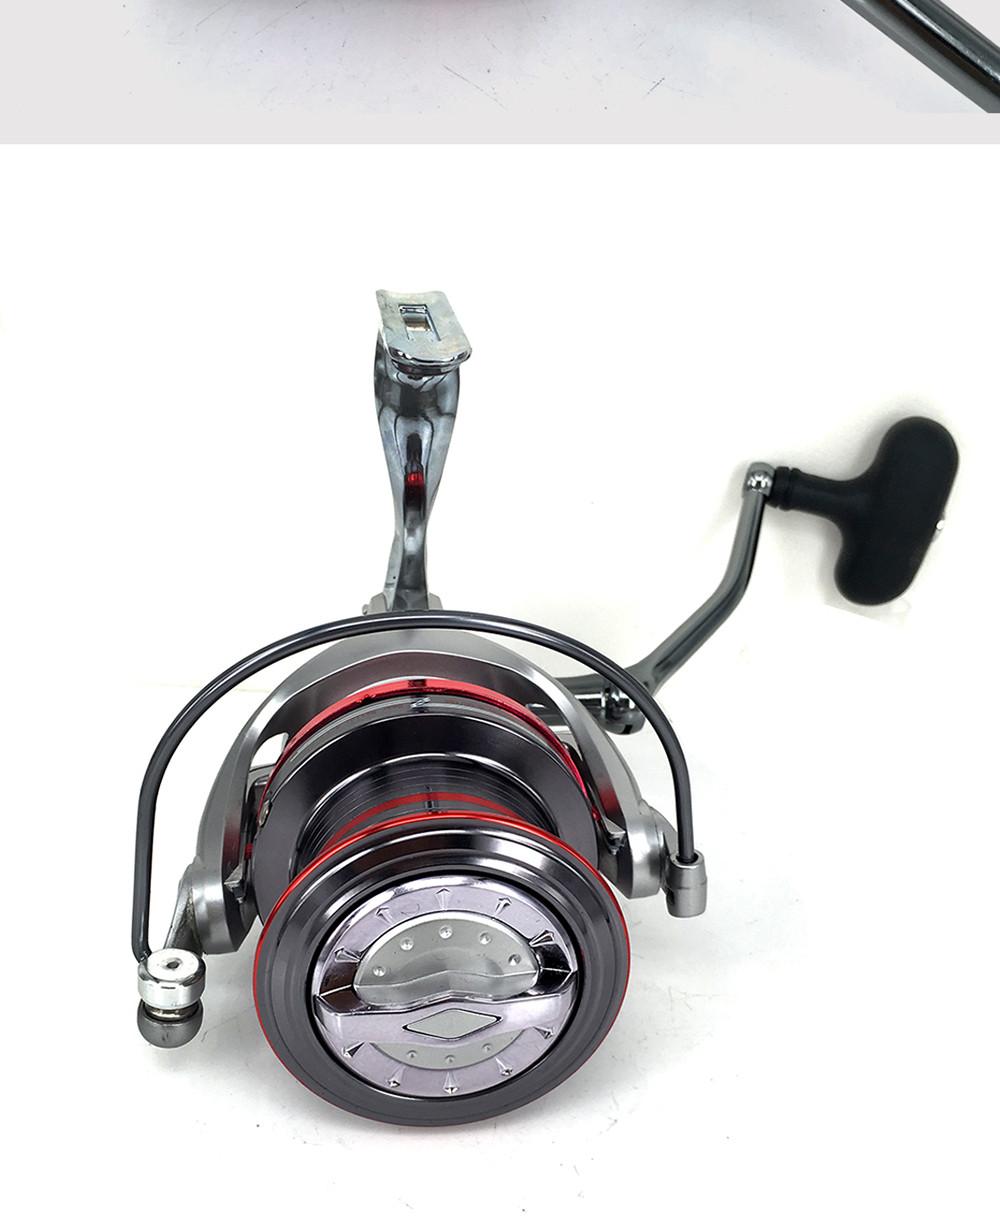 Bass 4.0:1 Stop118 Spinning 14